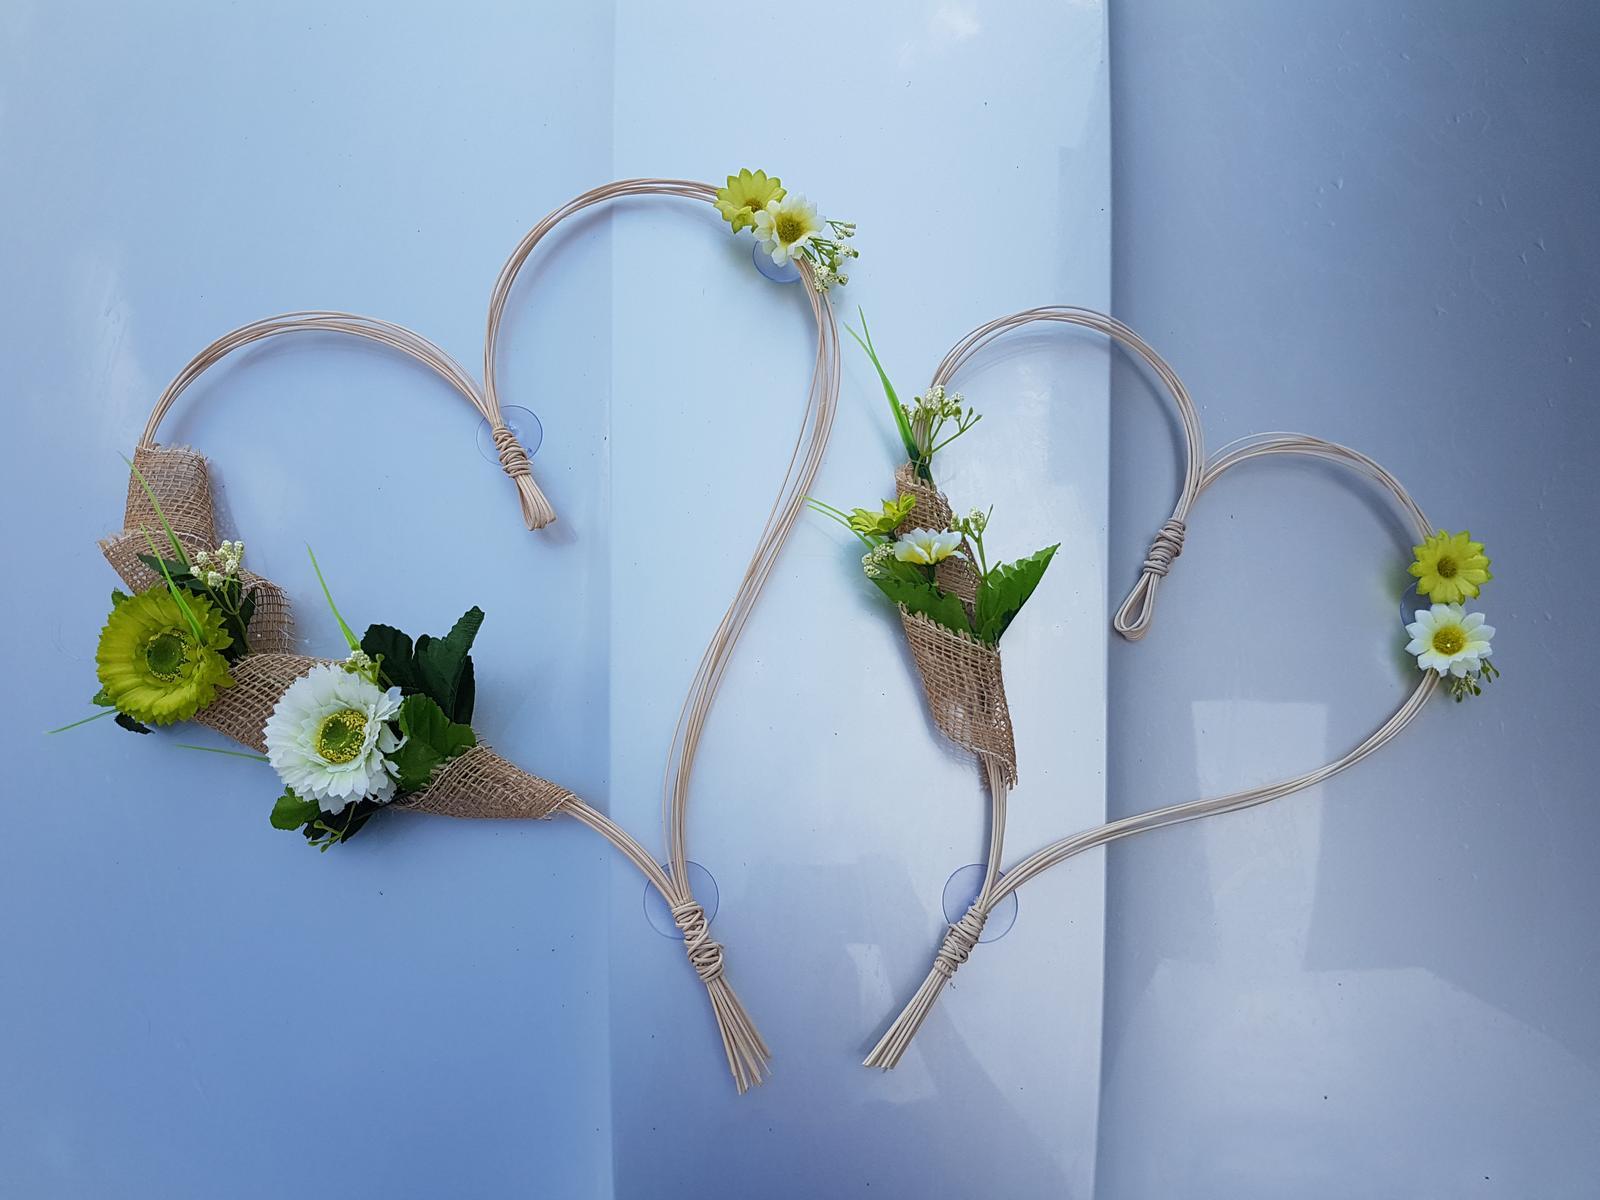 Srdce z pedigu s kytičkami a jutou (2 ks) - Obrázek č. 1